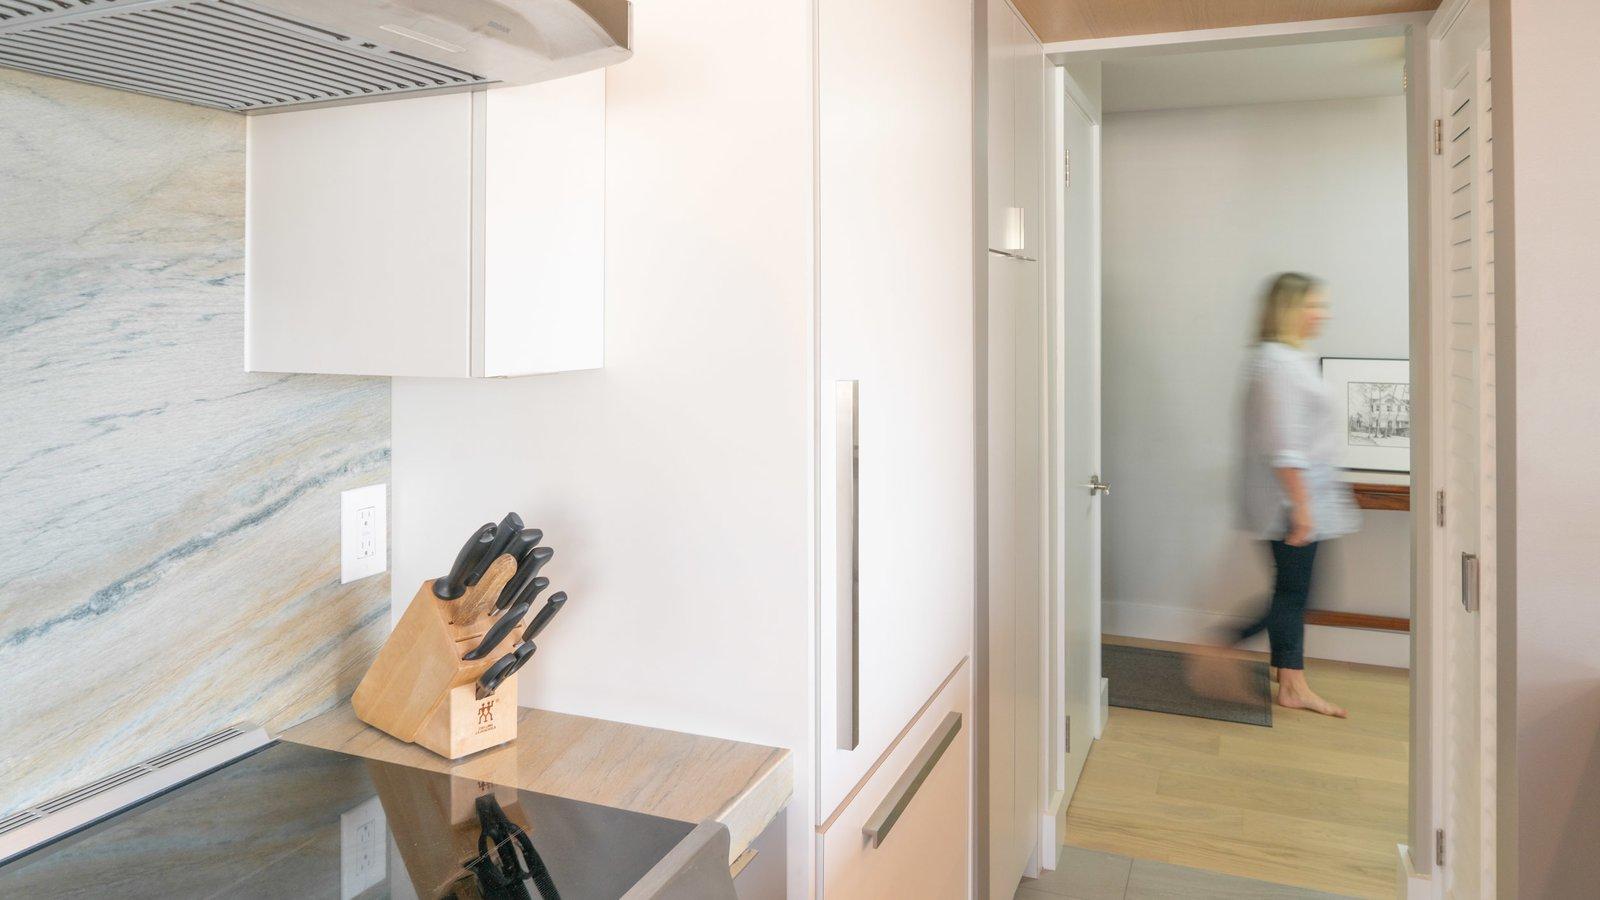 Kitchen, Granite Counter, Ceramic Tile Floor, White Cabinet, Range, Stone Slab Backsplashe, Range Hood, and Refrigerator  Scott Residence by District Architecture + Design